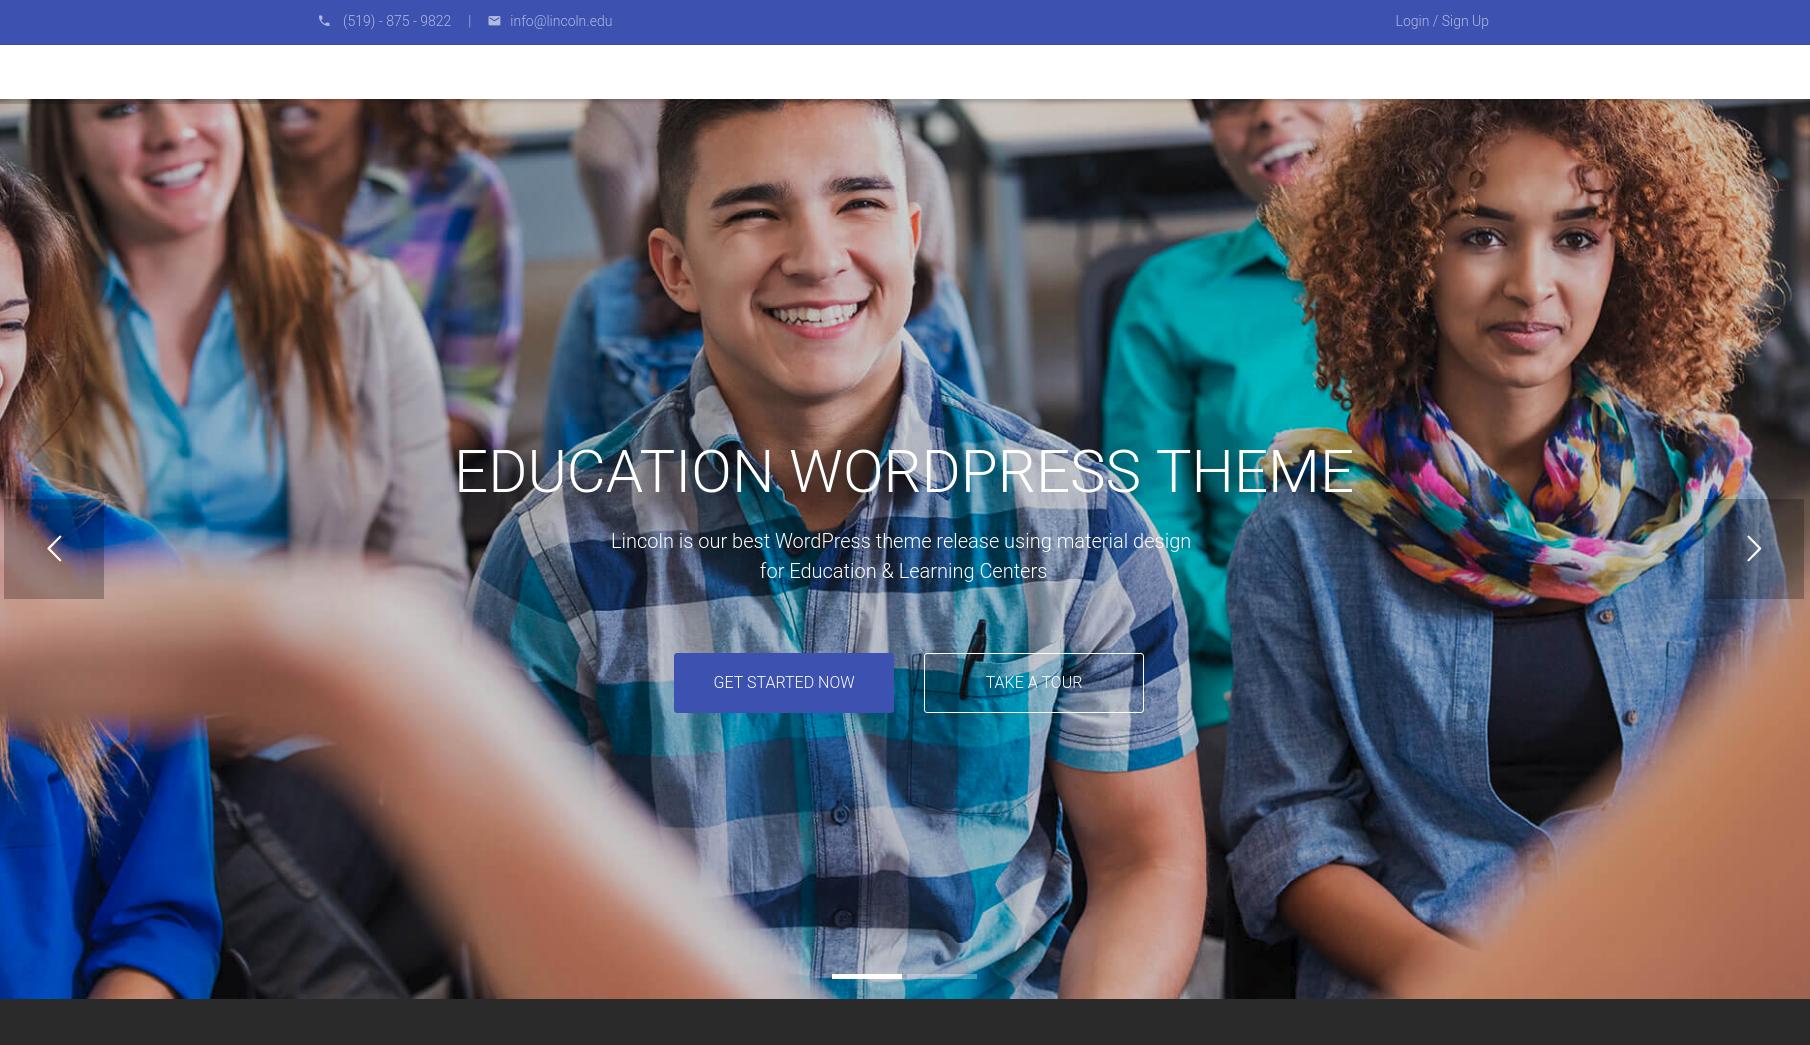 education wordpress theme